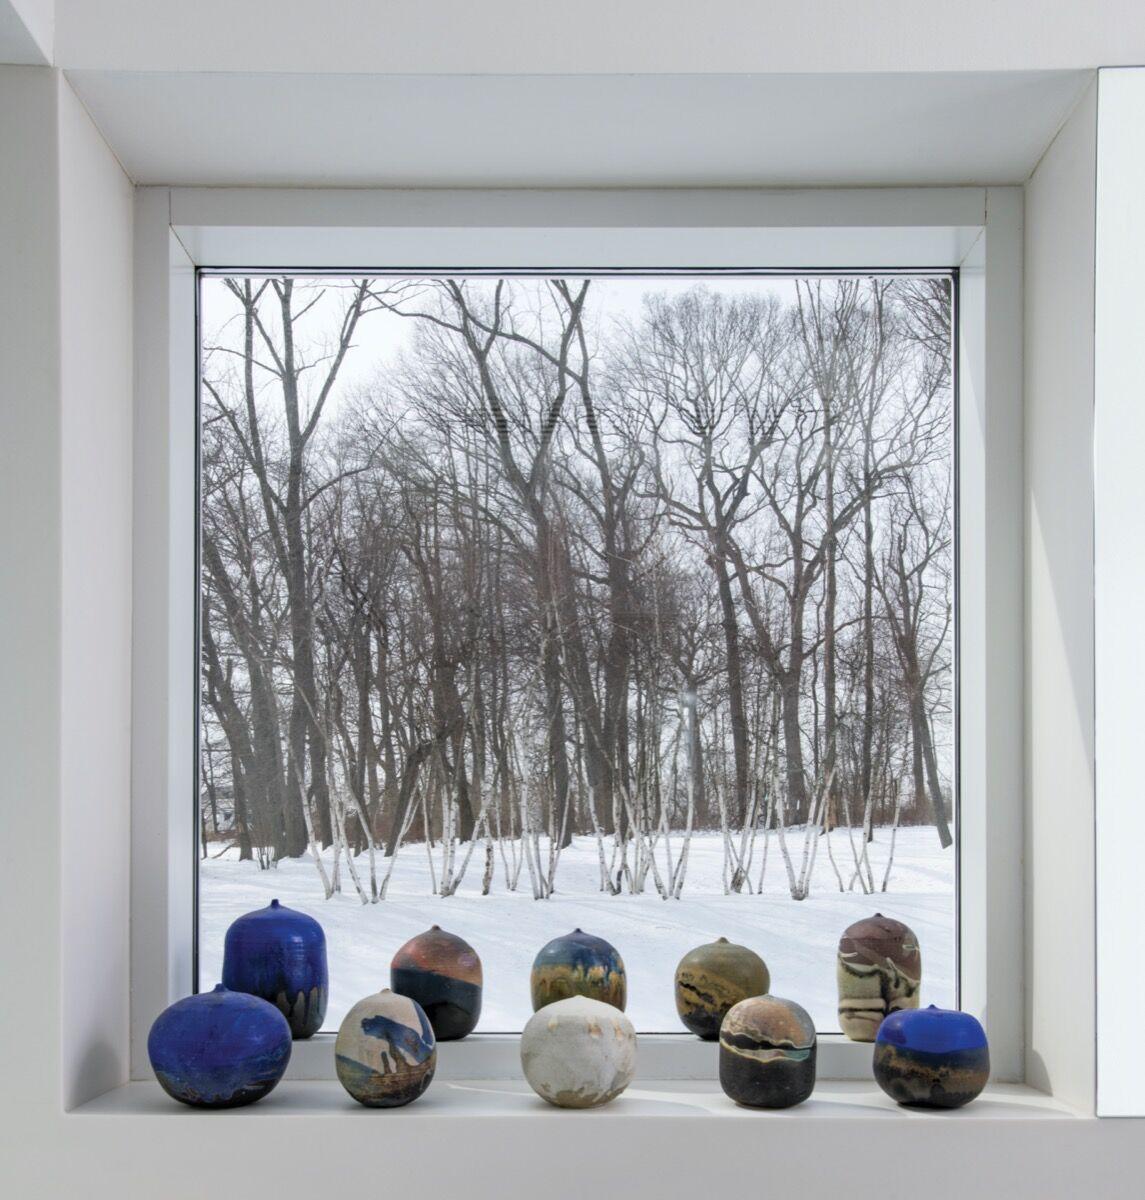 Installation view of works by Toshiko Takaezu. Photo by Tom Grotta. Courtesy of browngrotta arts.